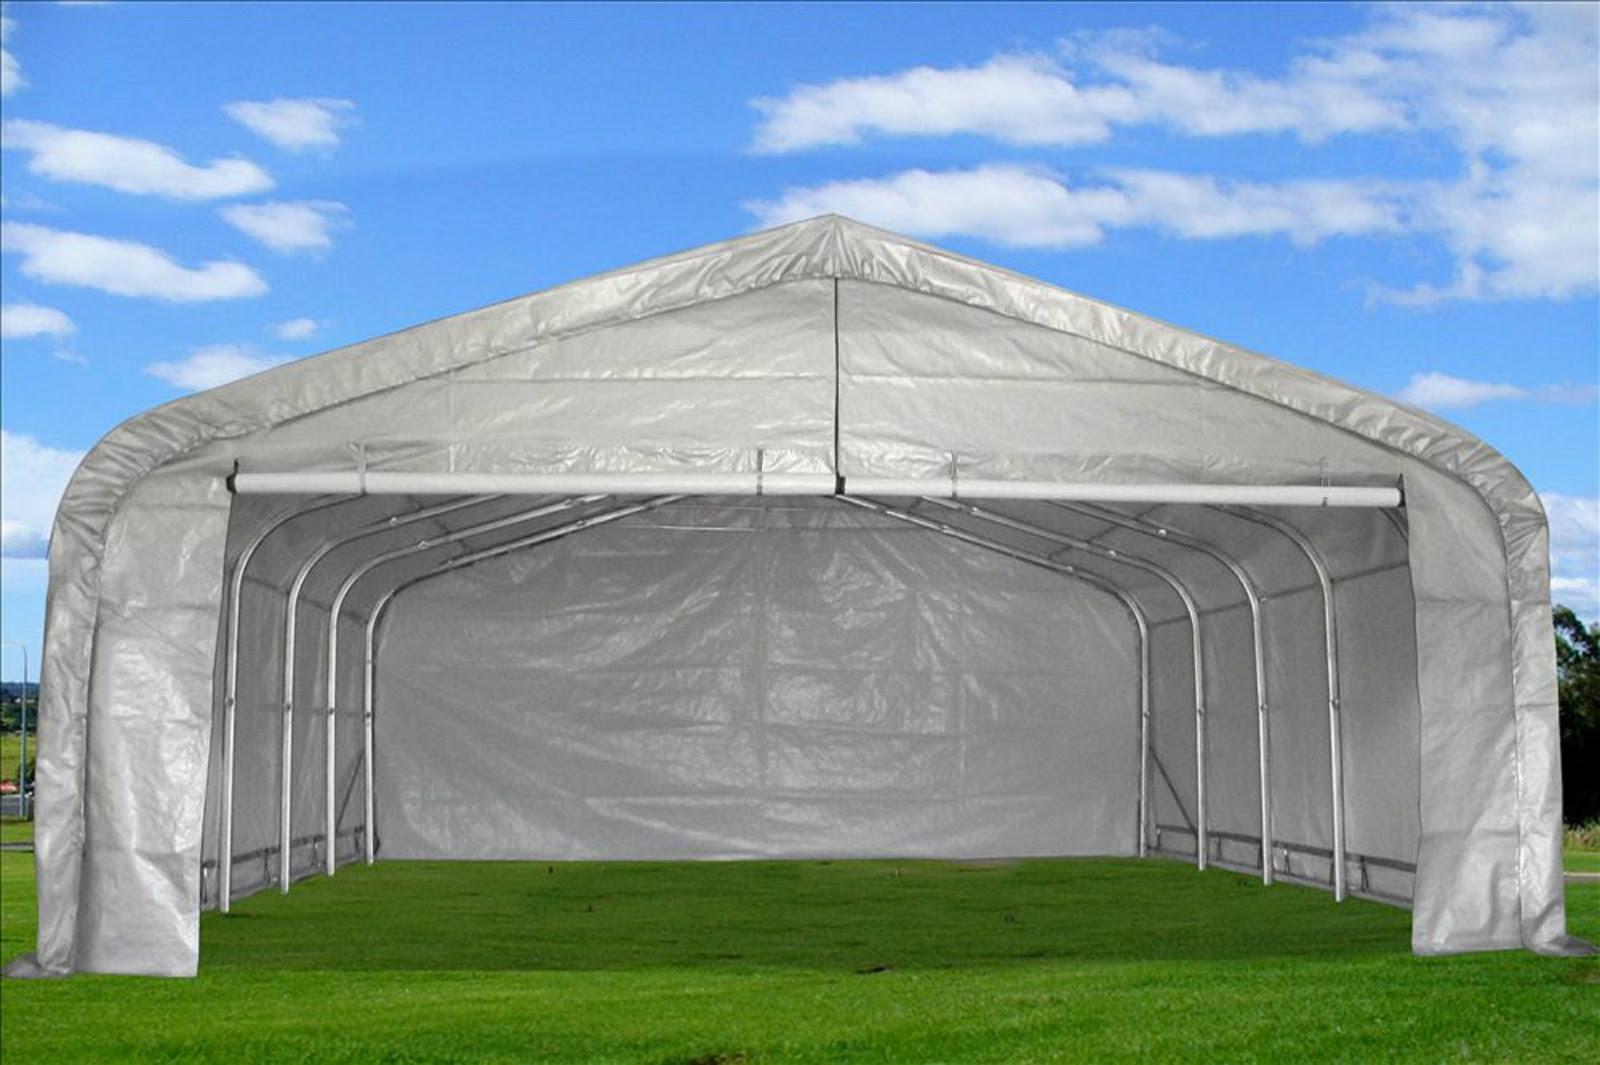 Carport 20'x22' - Garage Storage Canopy Shed Triangular Top